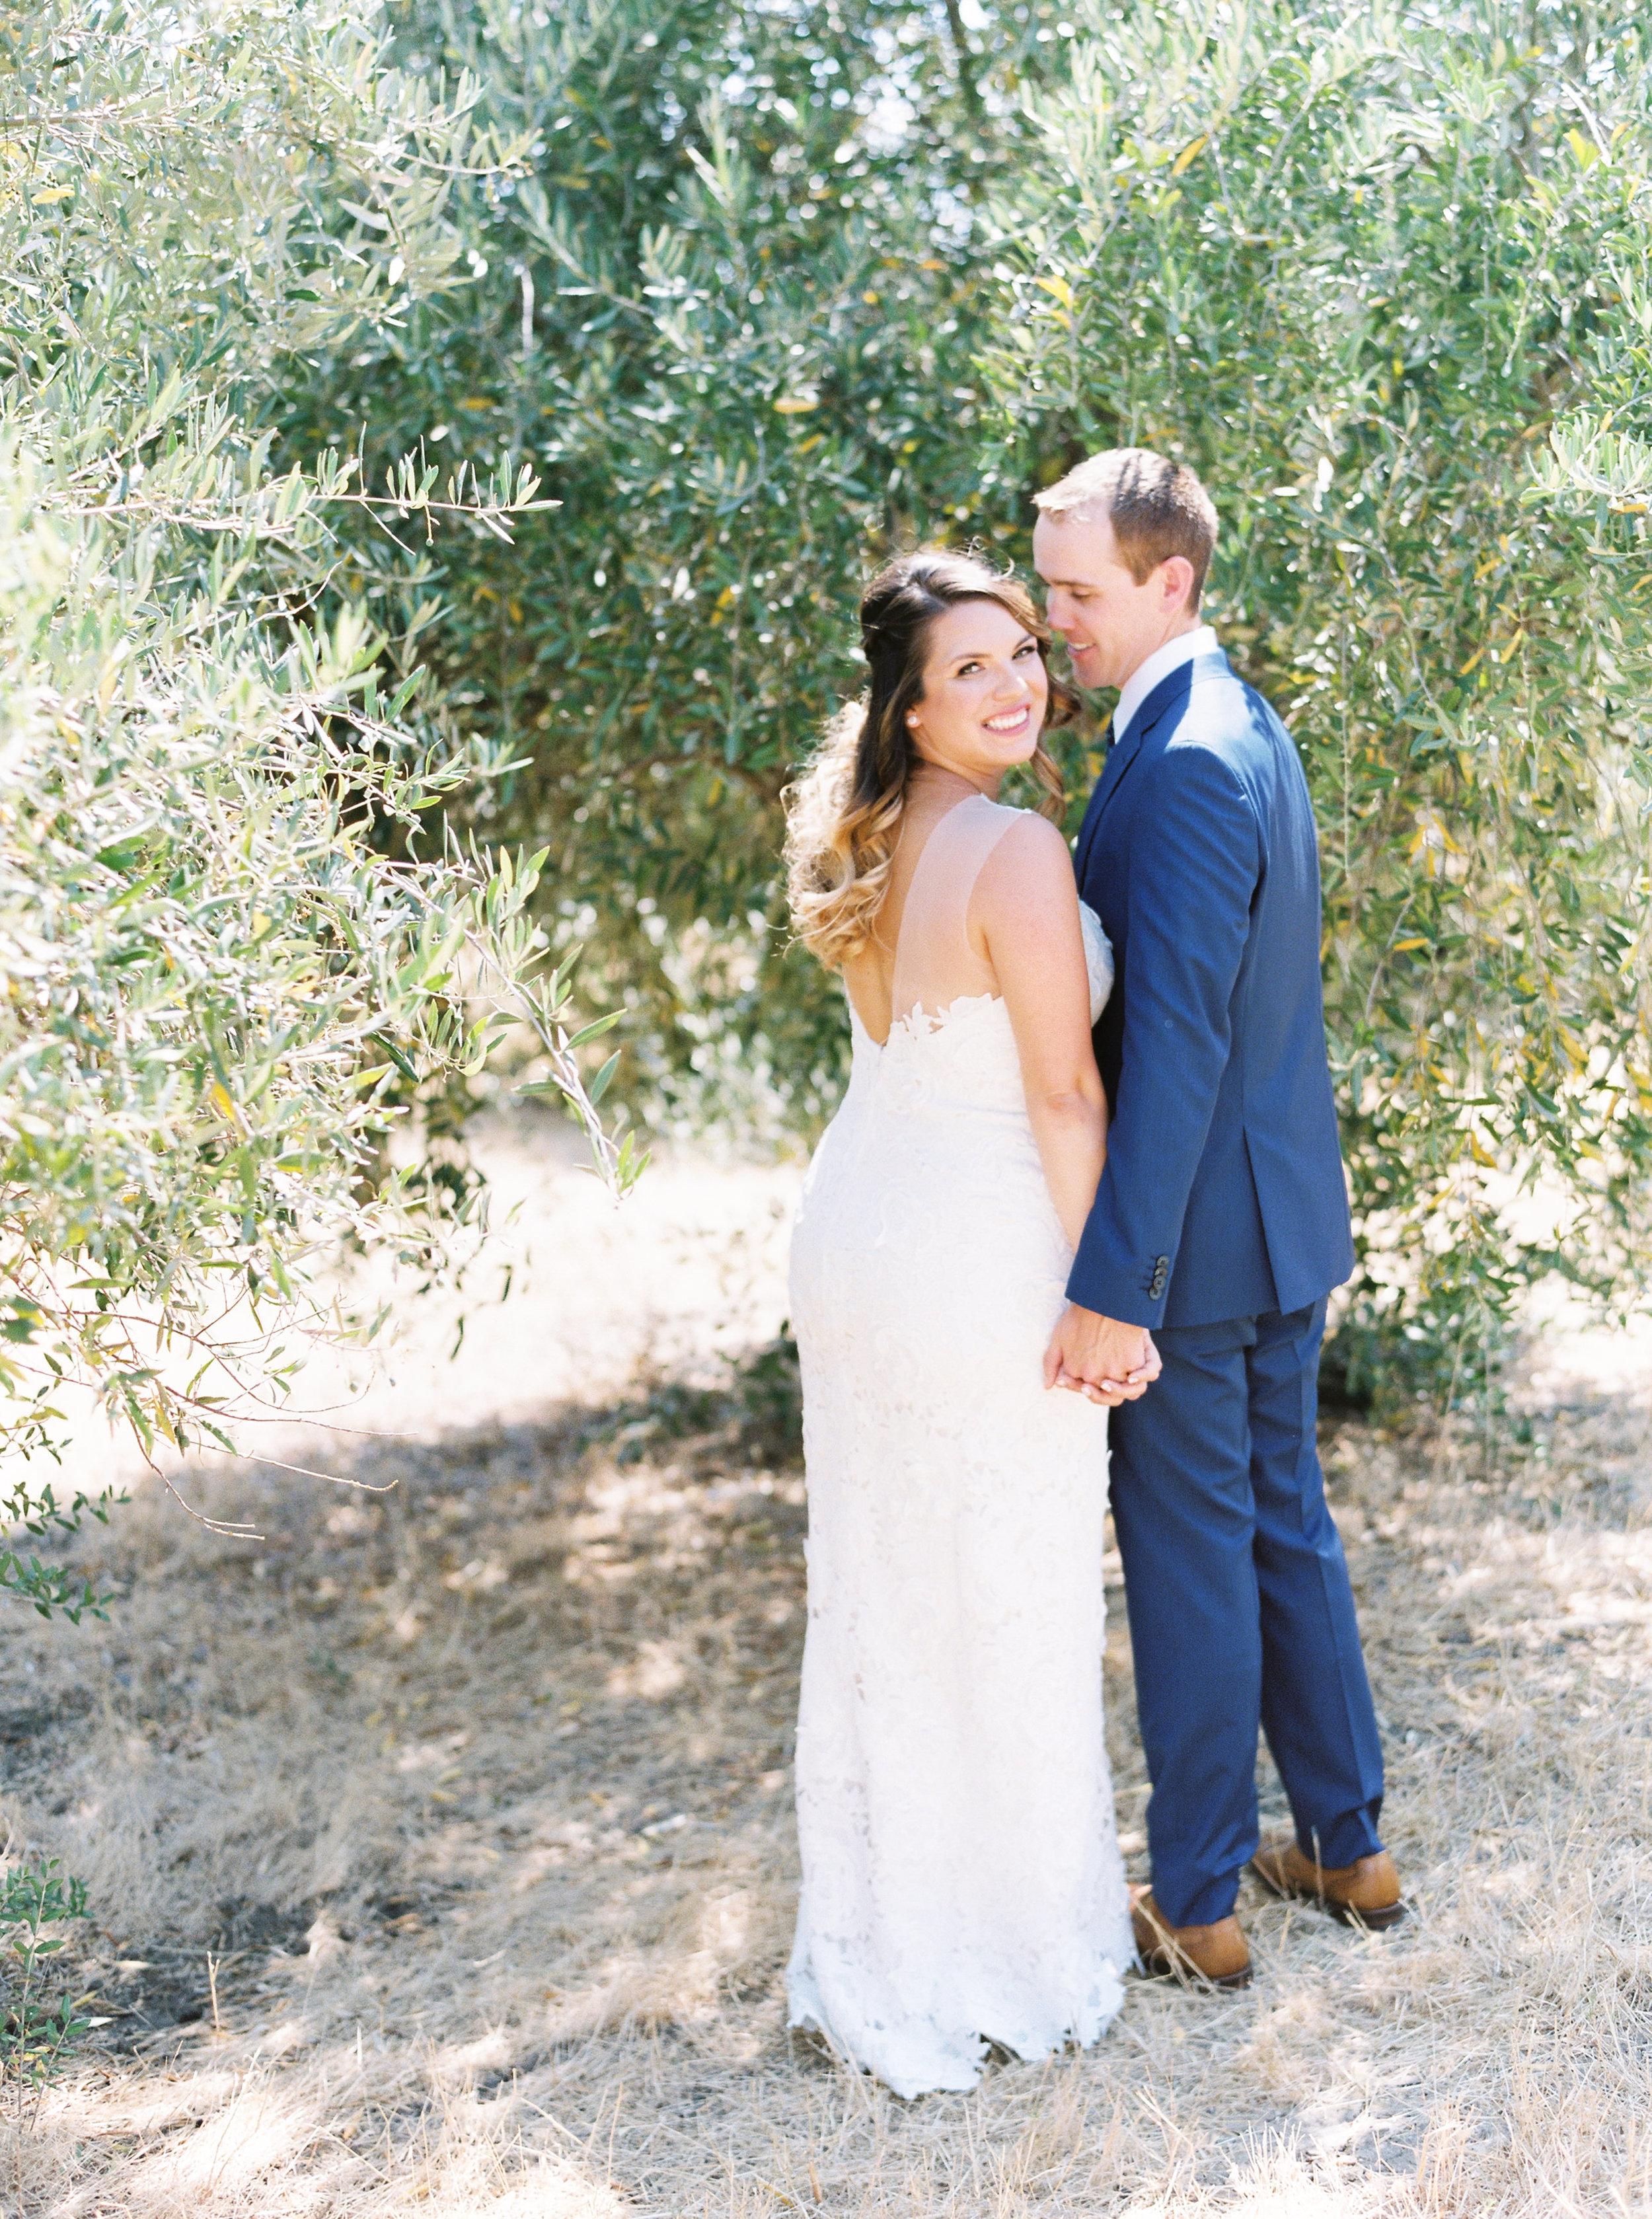 the-purple-orchid-resort-wedding-in-livermore-california-199.jpg